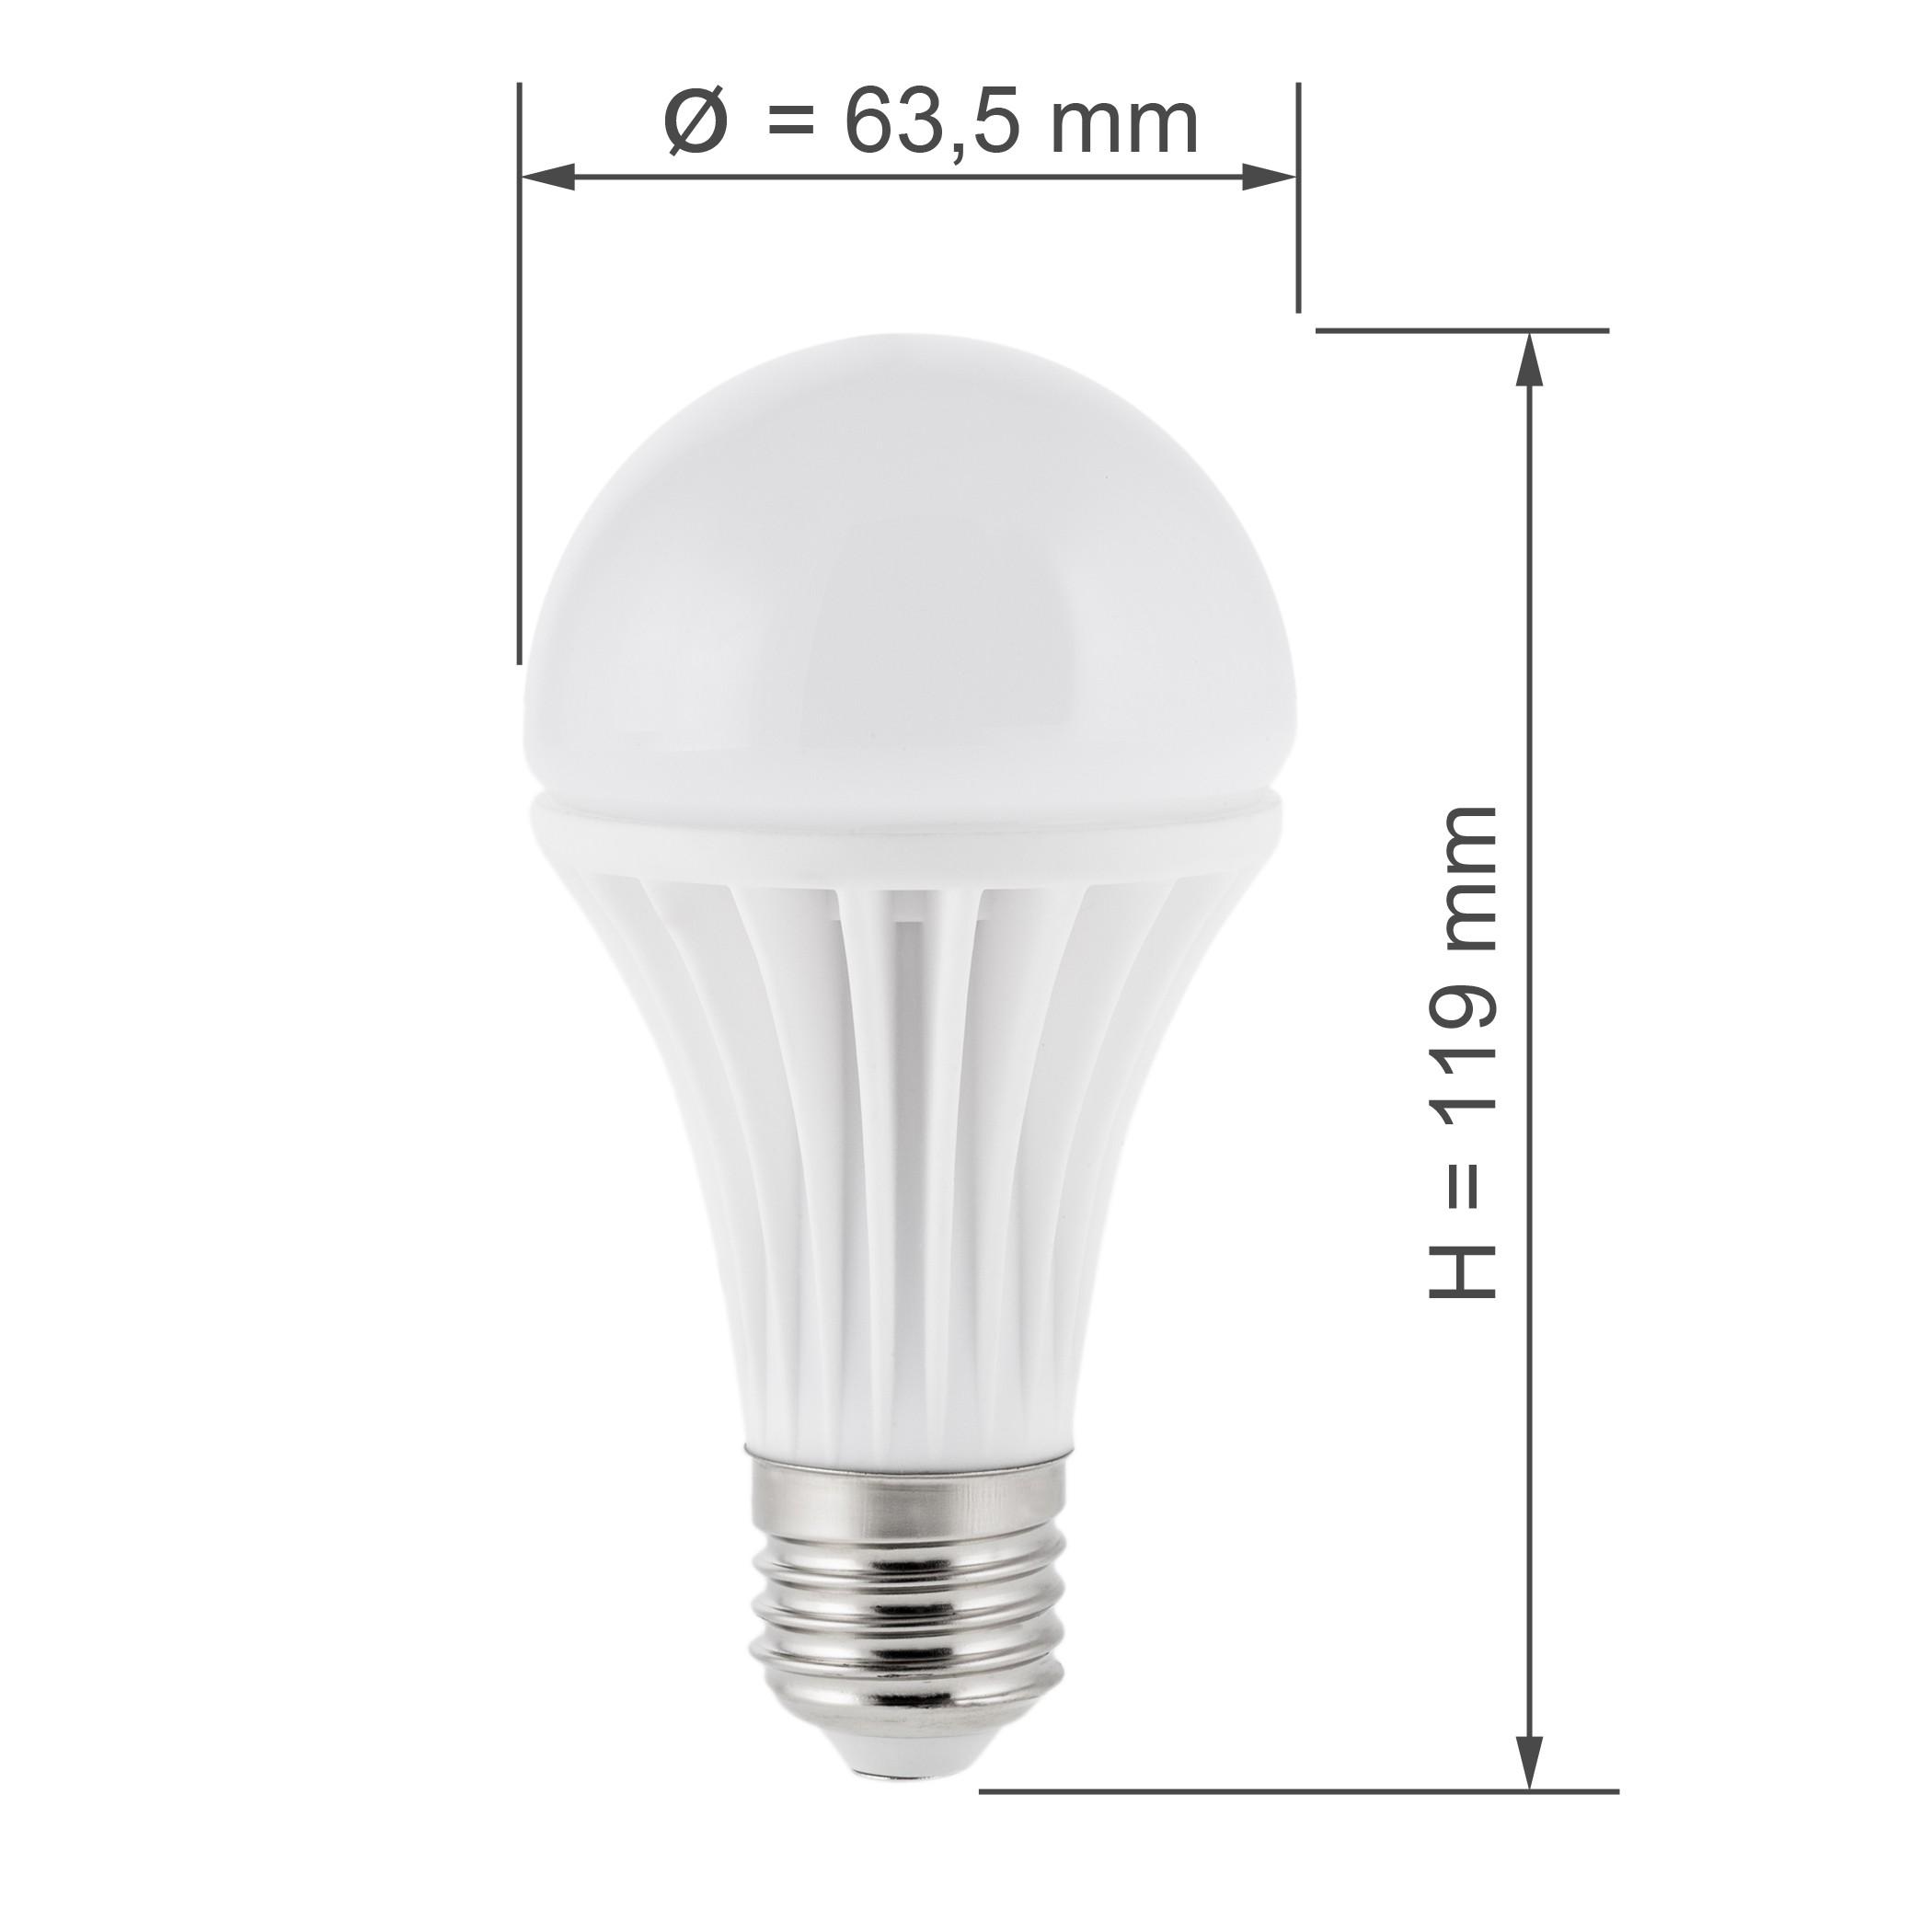 E27-A65-12W---30 Schöne Led Lampen E27 60 Watt Dekorationen